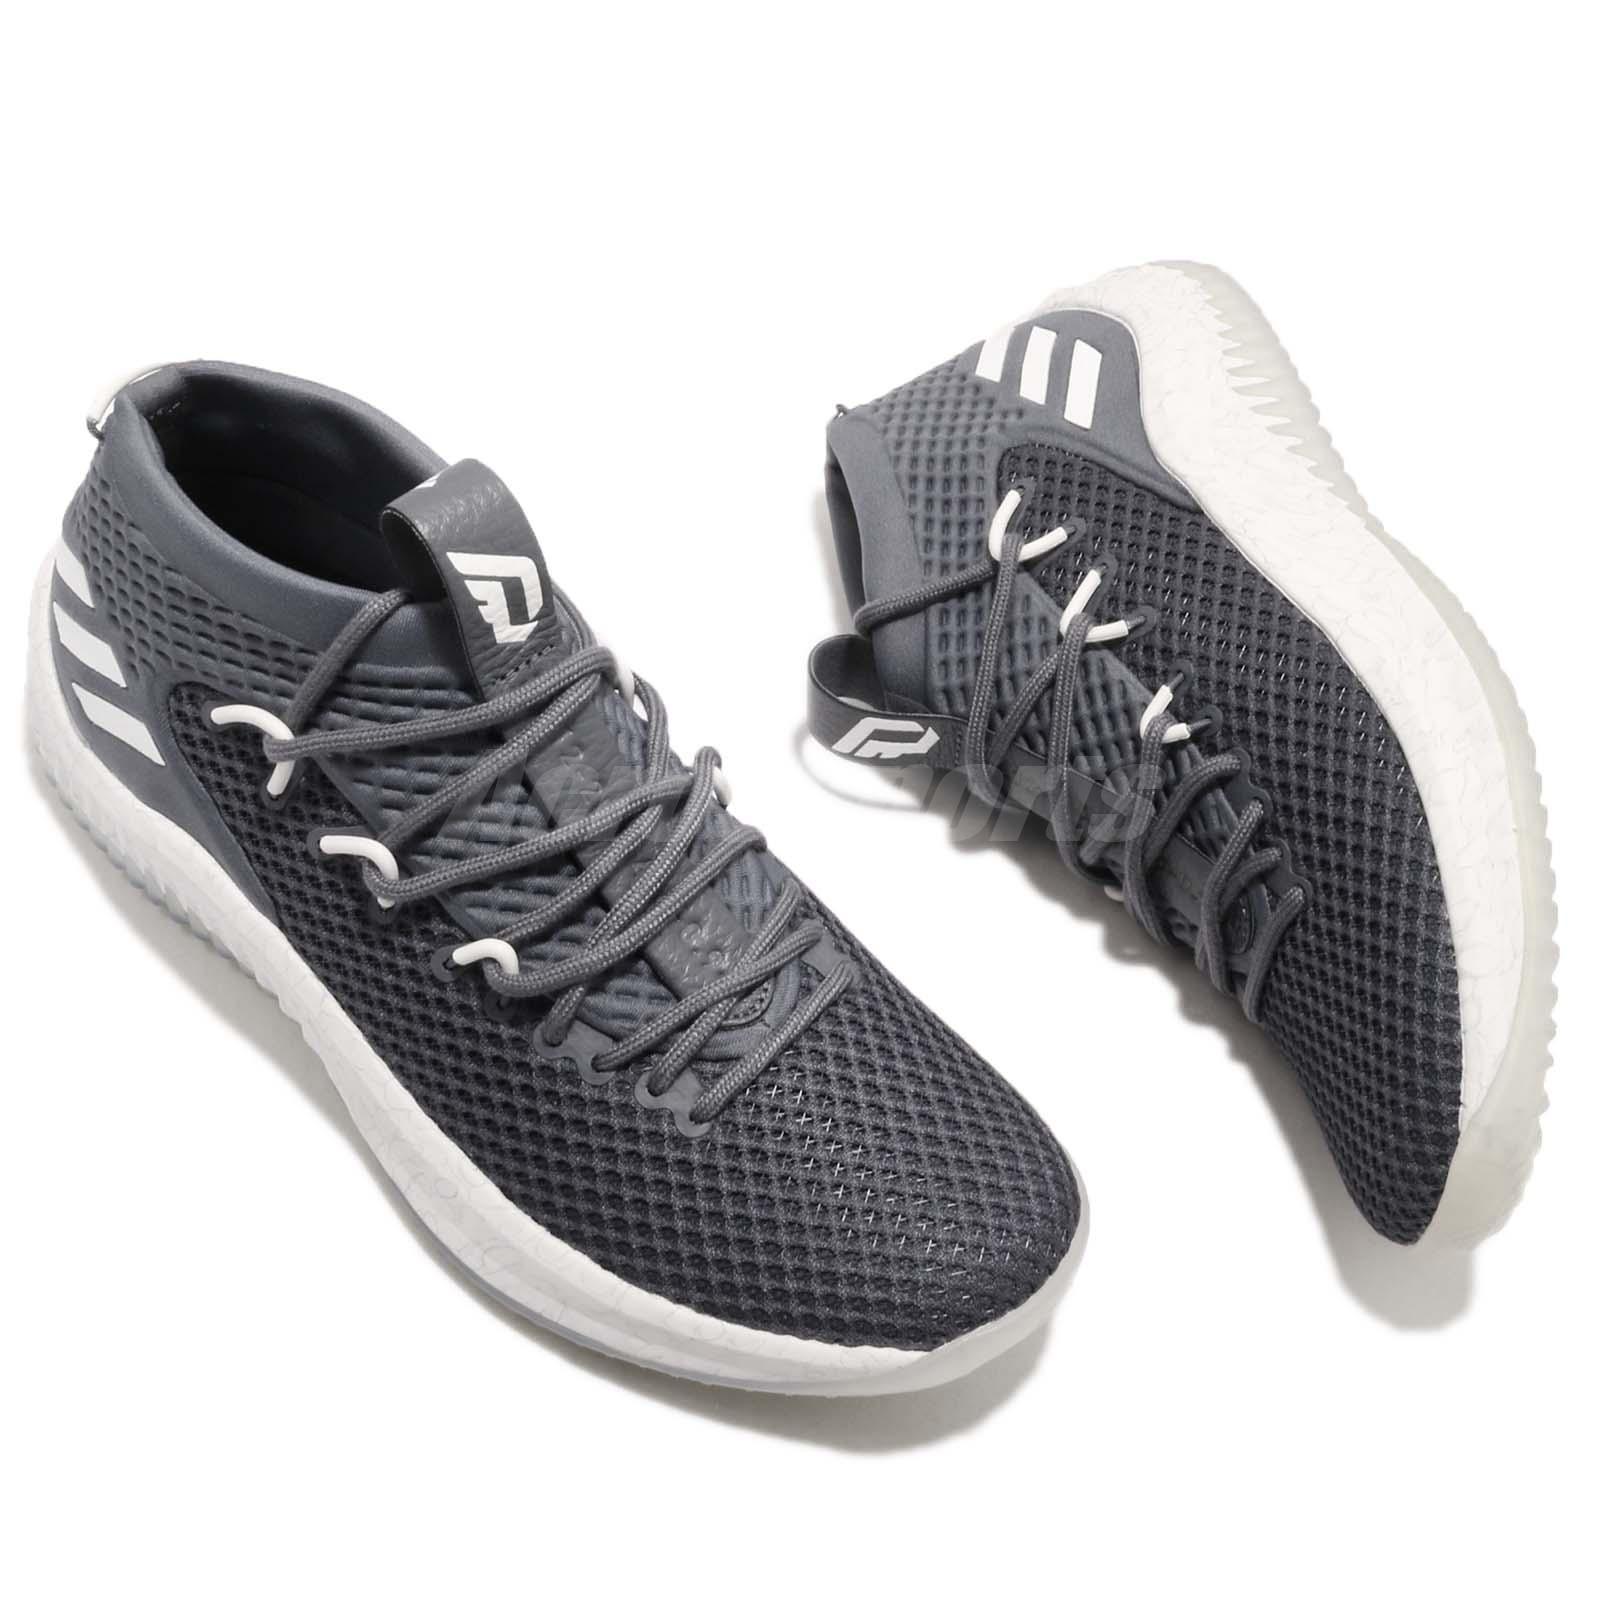 best loved 9b9a6 c55ac adidas Dame 4 Damian Lillard Onix Grey White Men Basketball